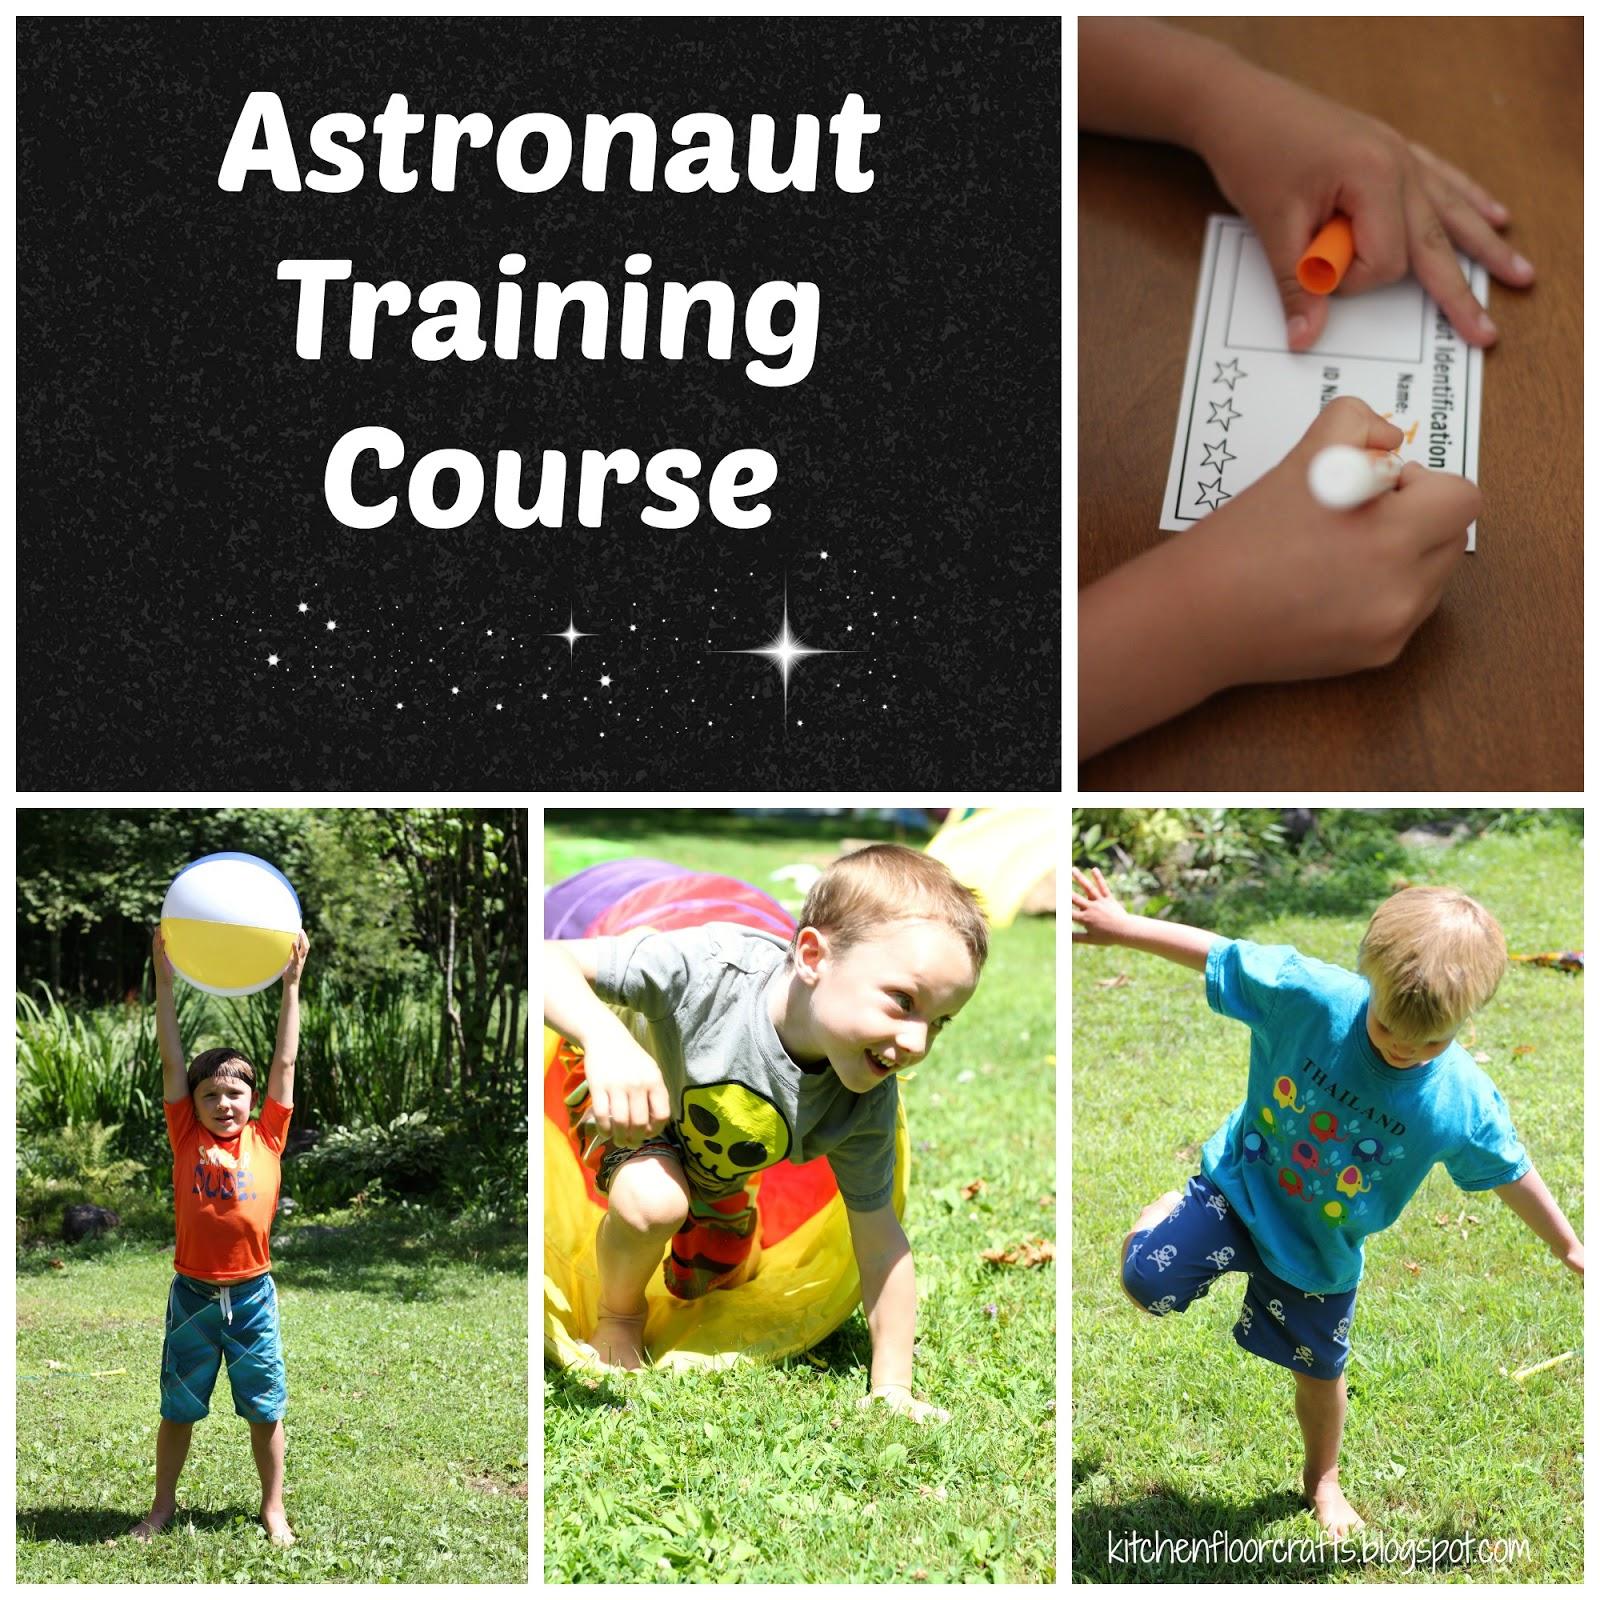 Kitchen Floor Crafts Astronaut Training Course